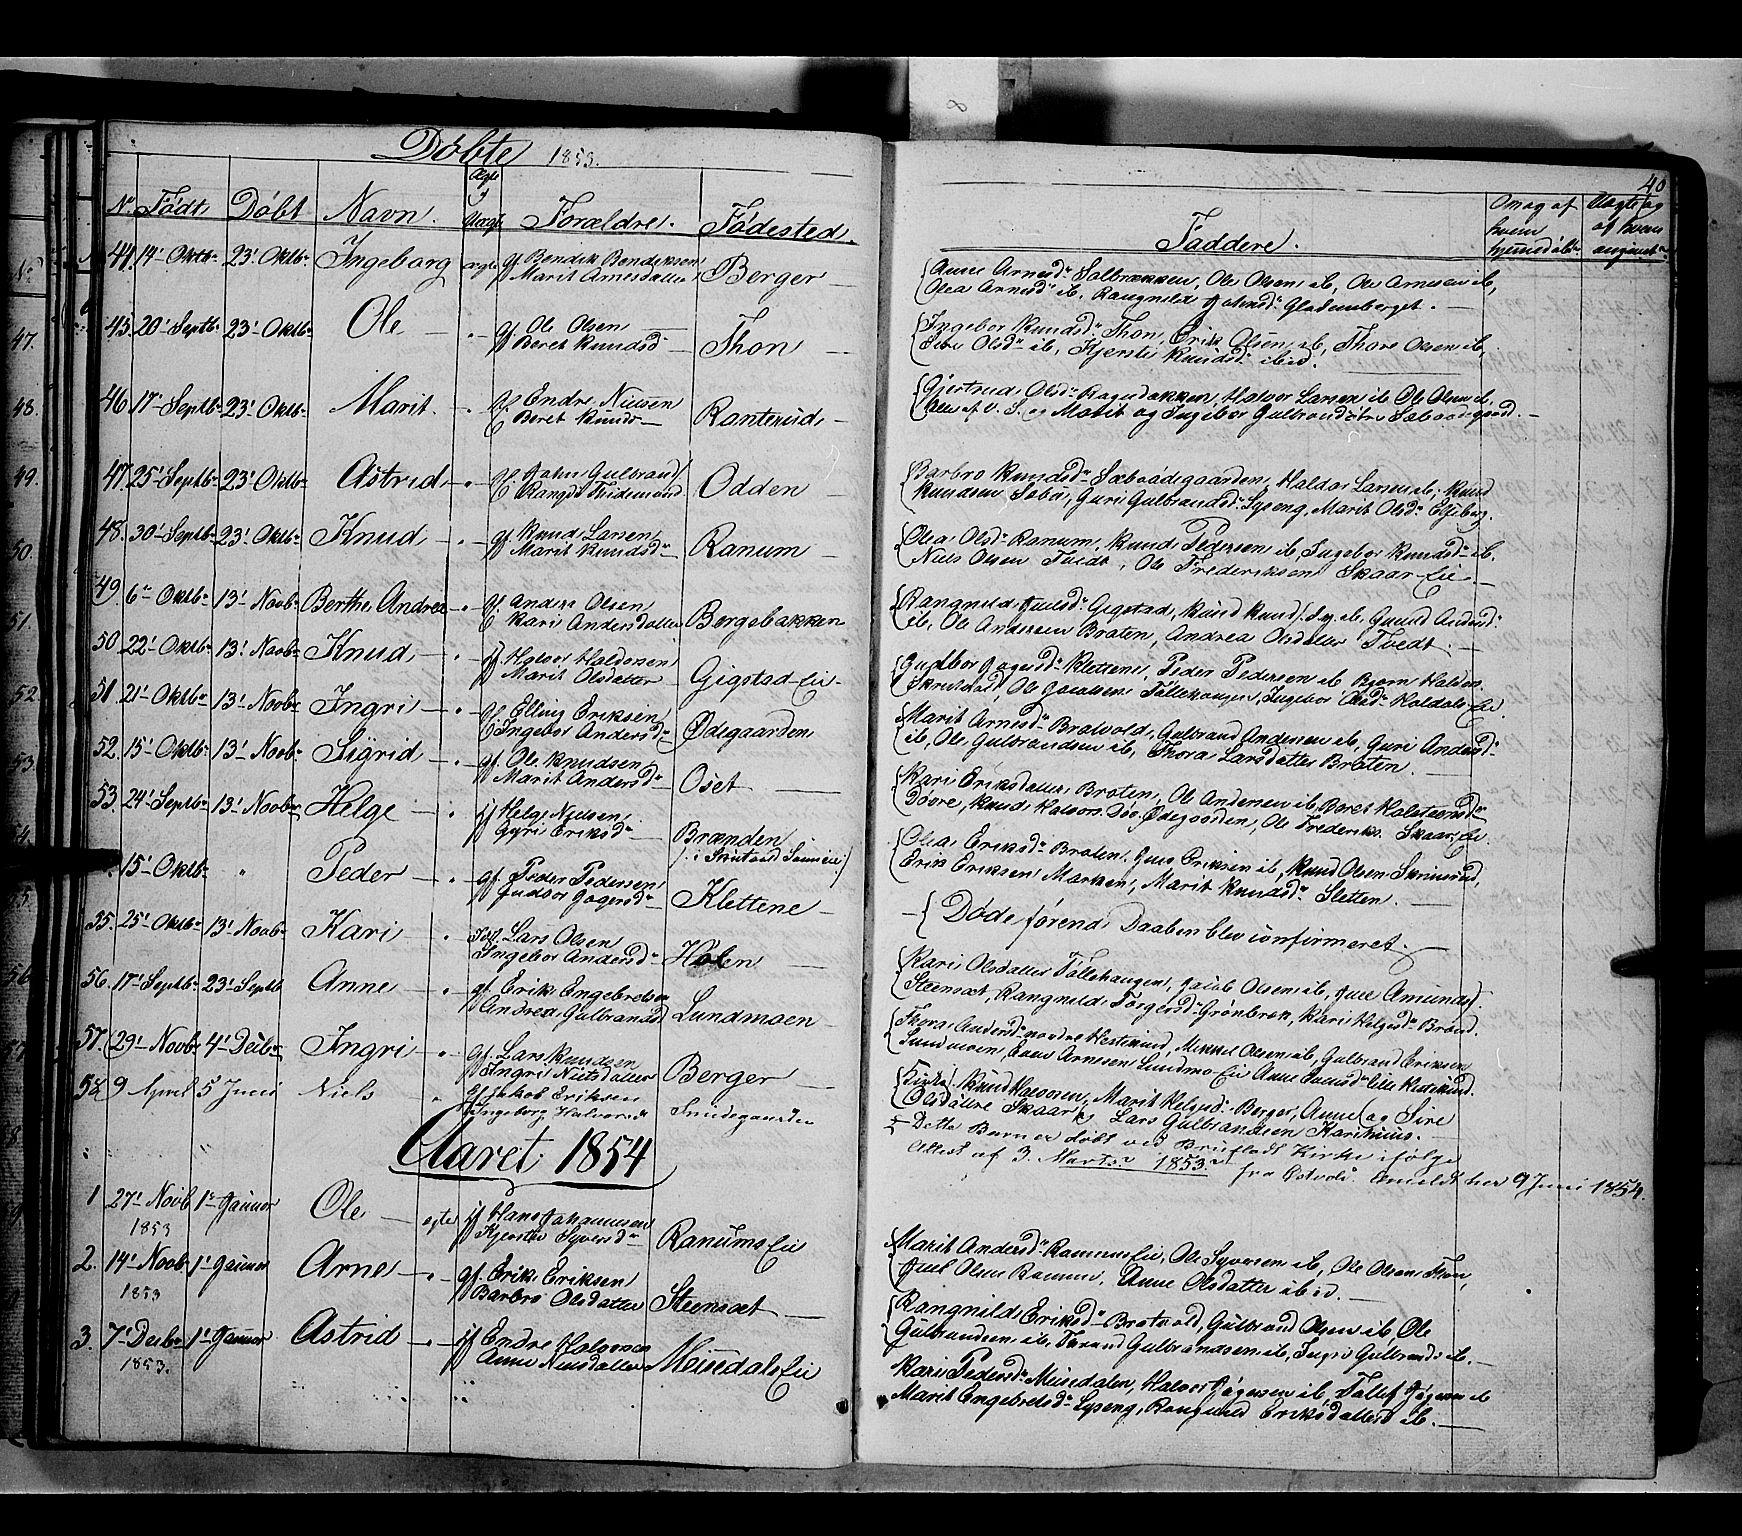 SAH, Nord-Aurdal prestekontor, Ministerialbok nr. 7, 1842-1863, s. 40